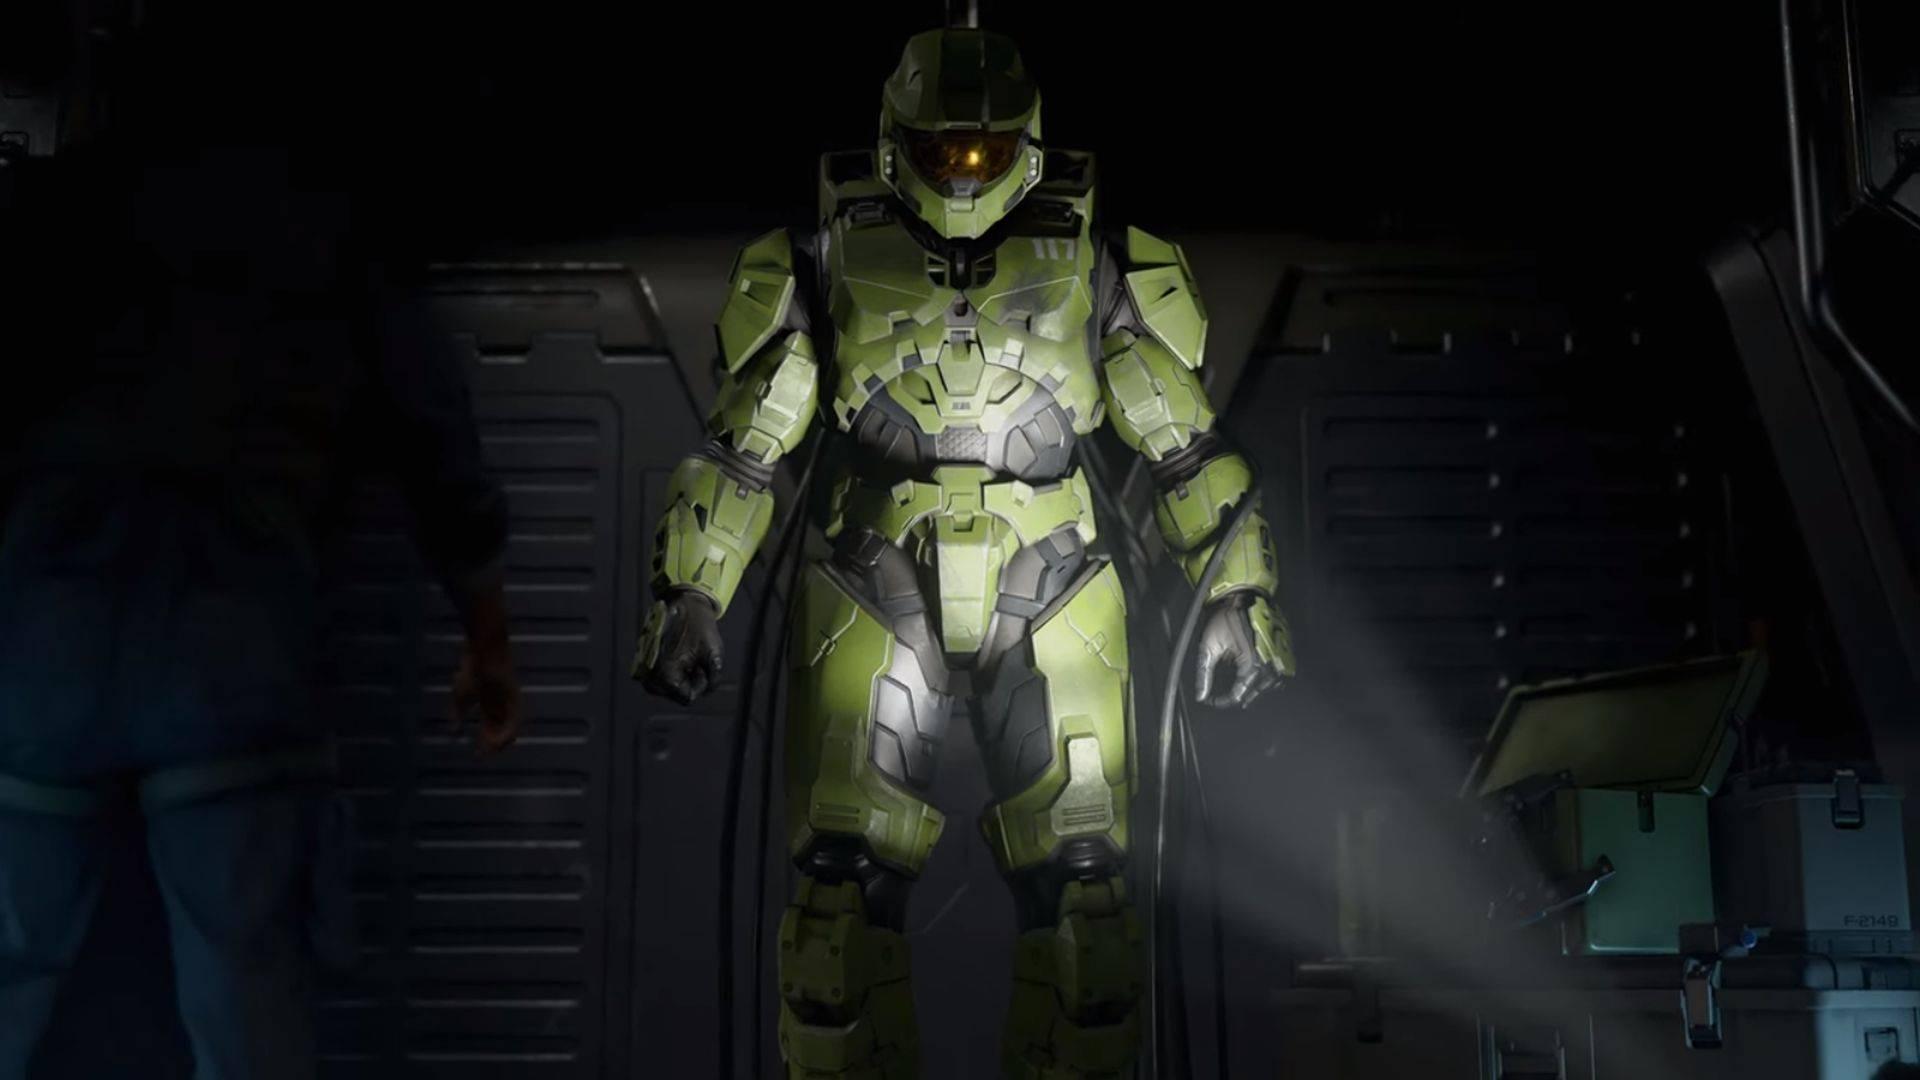 Halo Infinite llegará junto a Project Scarlett en 2020 #E32019